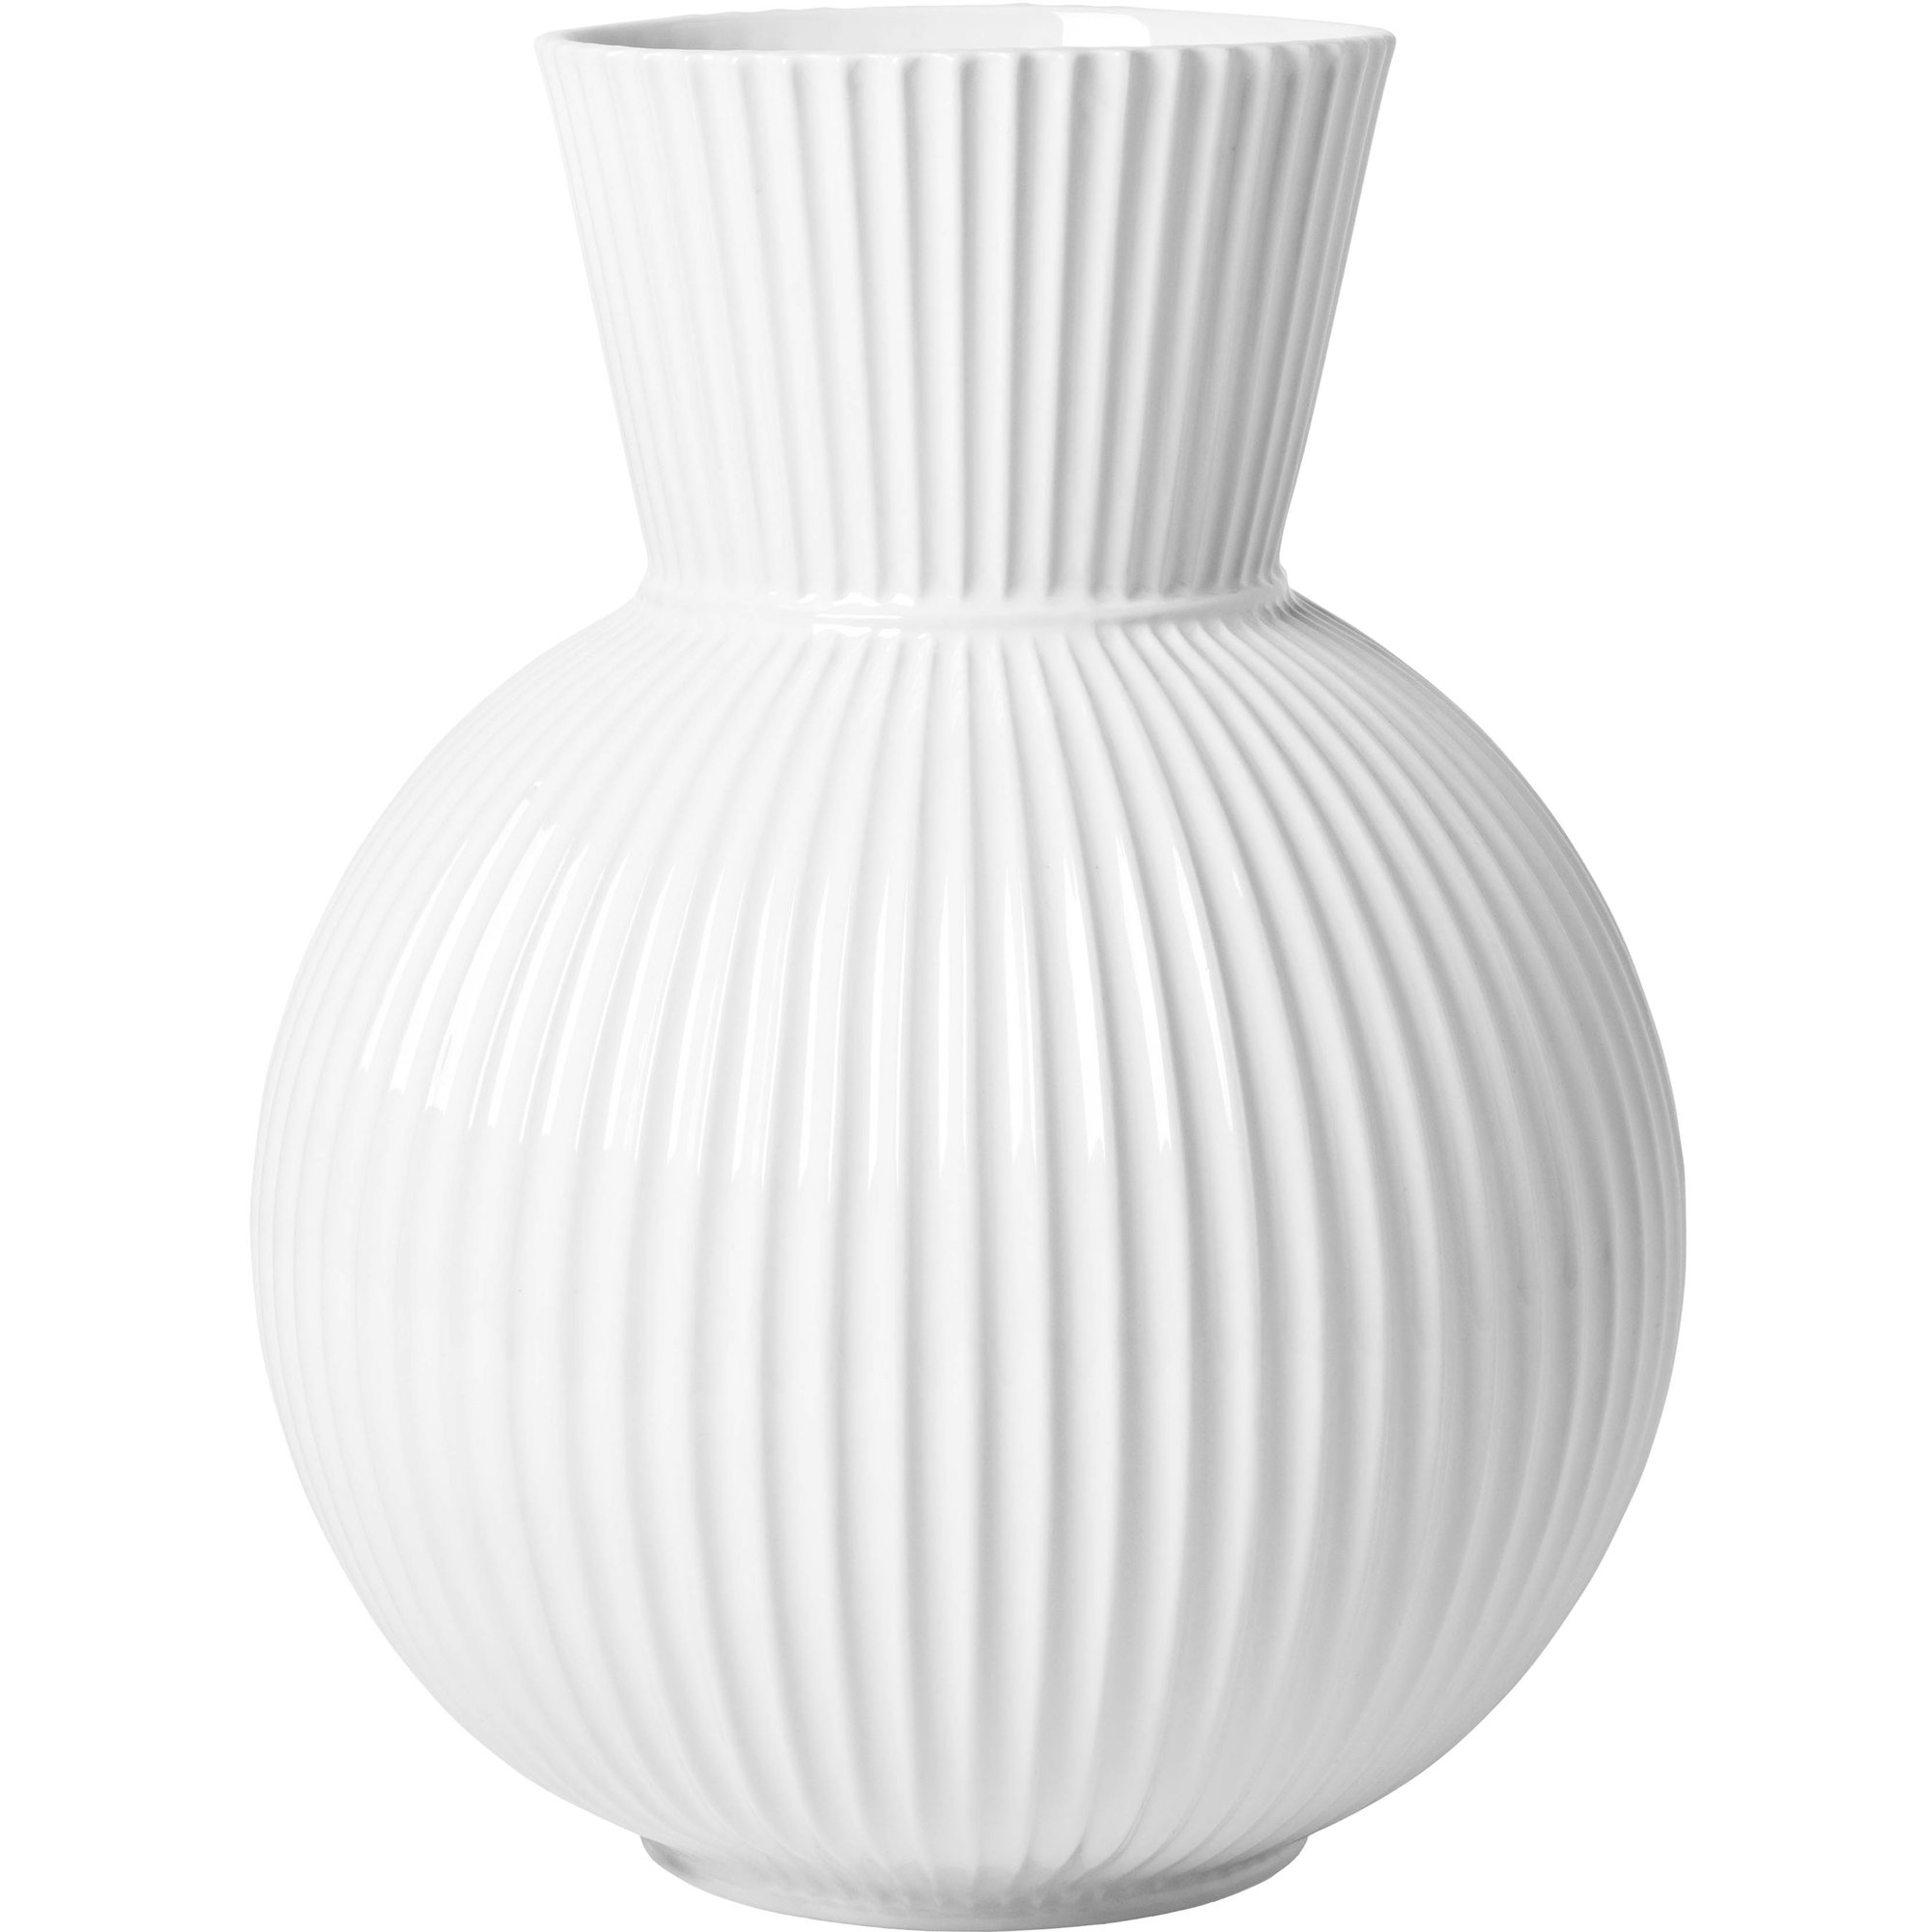 Lyngby Porcelæn Tura Vas 26 cm.